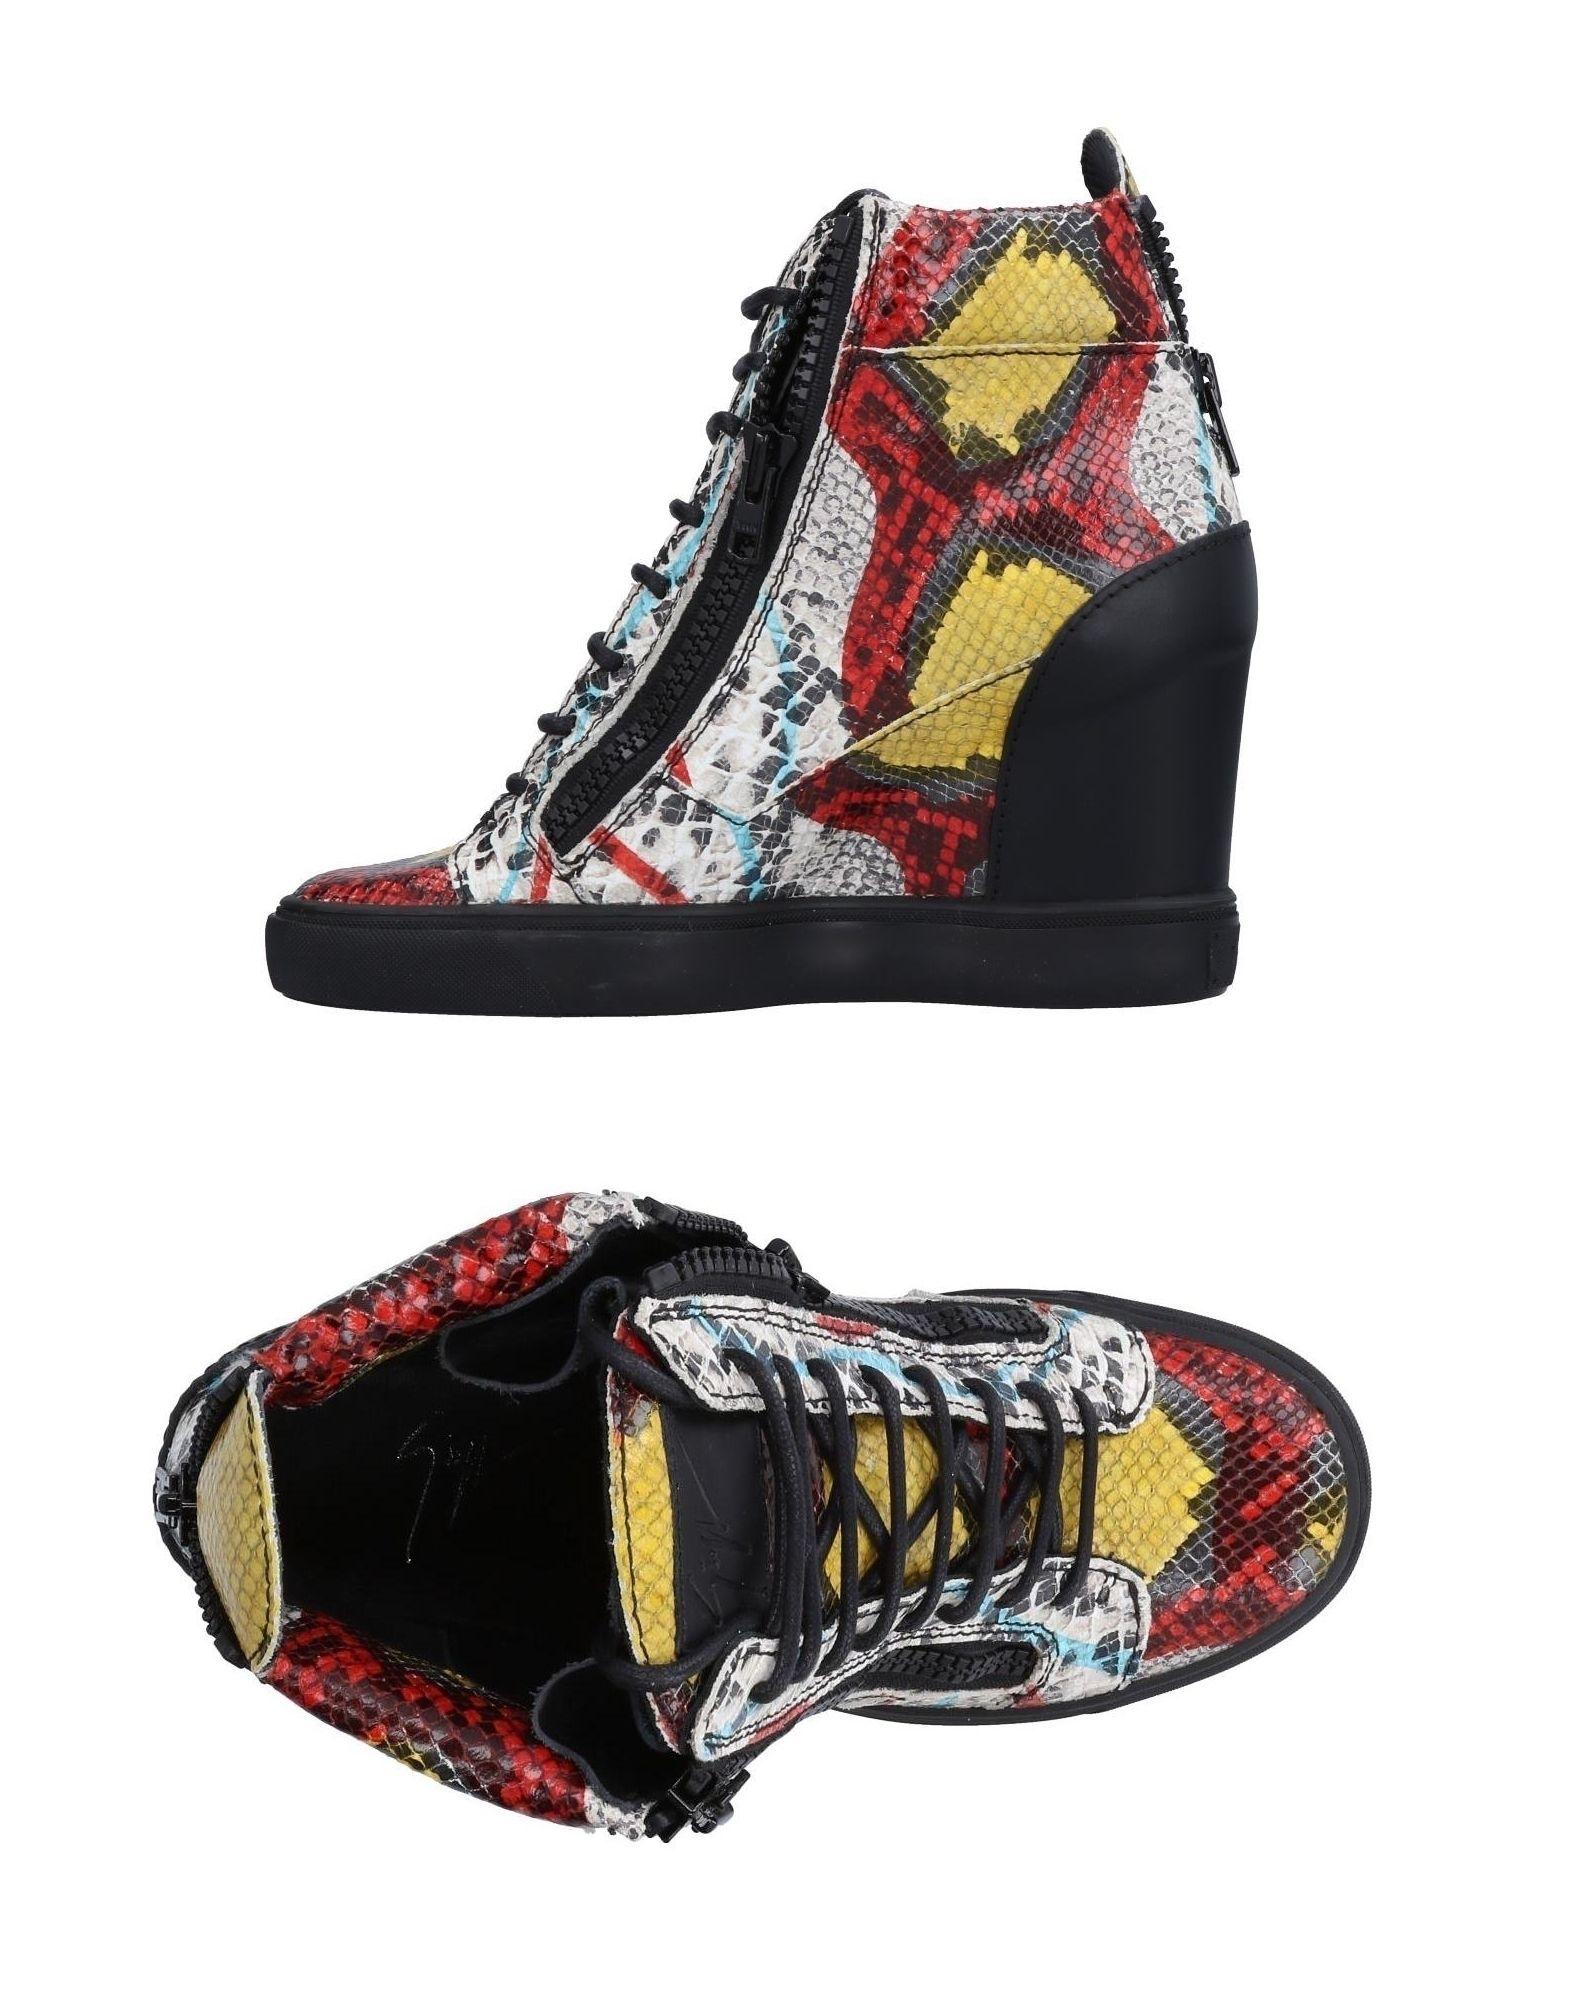 Giuseppe Zanotti Sneakers - Women Giuseppe  Zanotti Sneakers online on  Giuseppe Canada - 11504061TI 503882